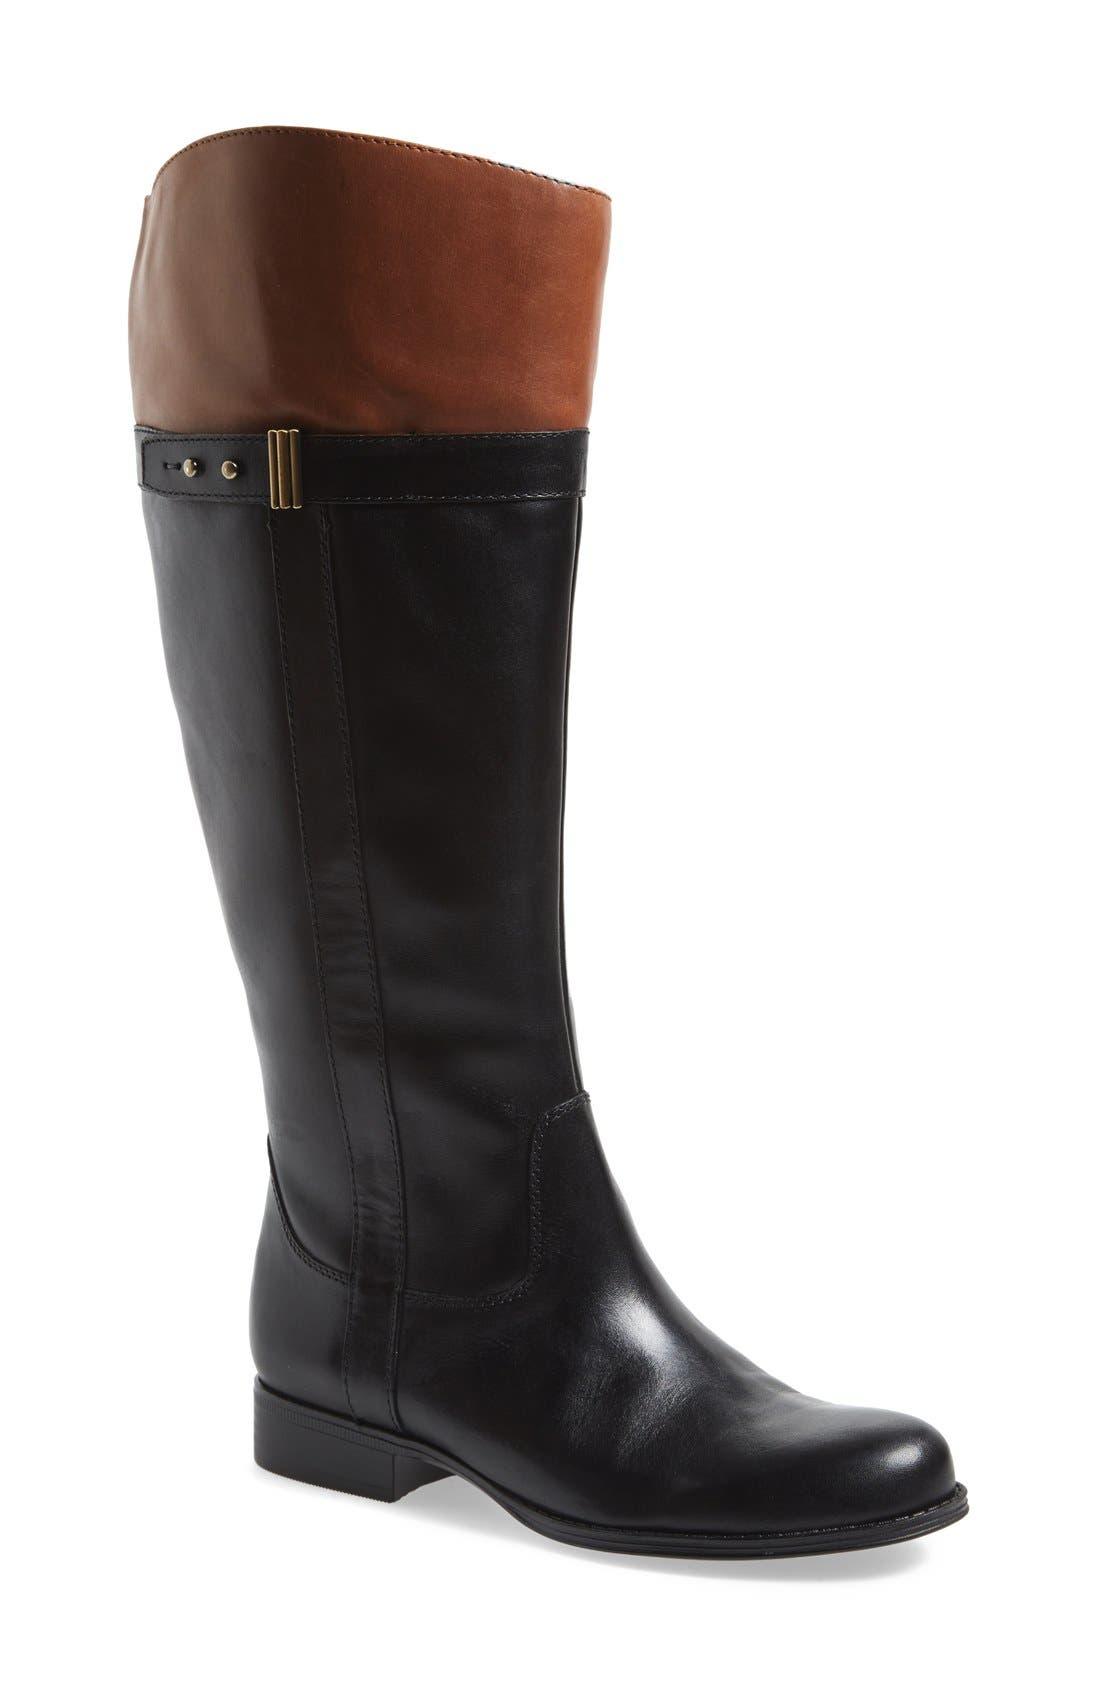 Alternate Image 1 Selected - Naturalizer 'Josette' Knee High Boot (Women)